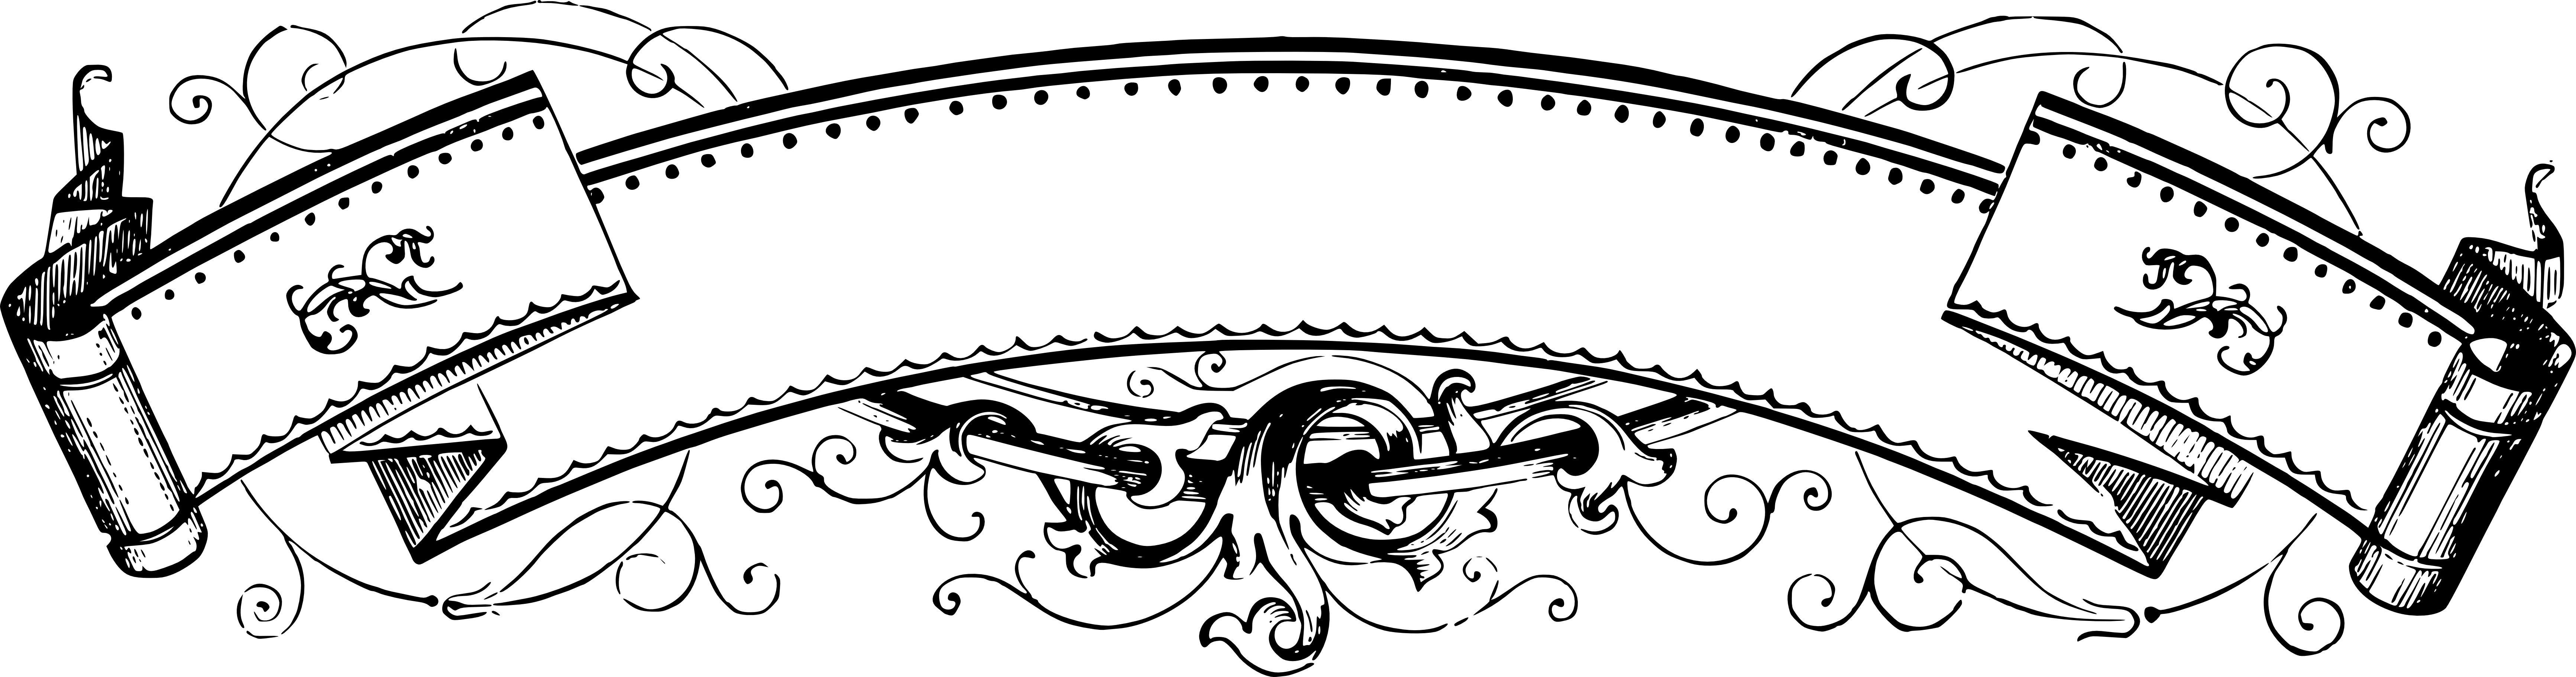 Ribbon vector vintage clipart svg transparent stock Royalty Free Images - Vintage Ribbon Vector Art & Clip Art ... svg transparent stock